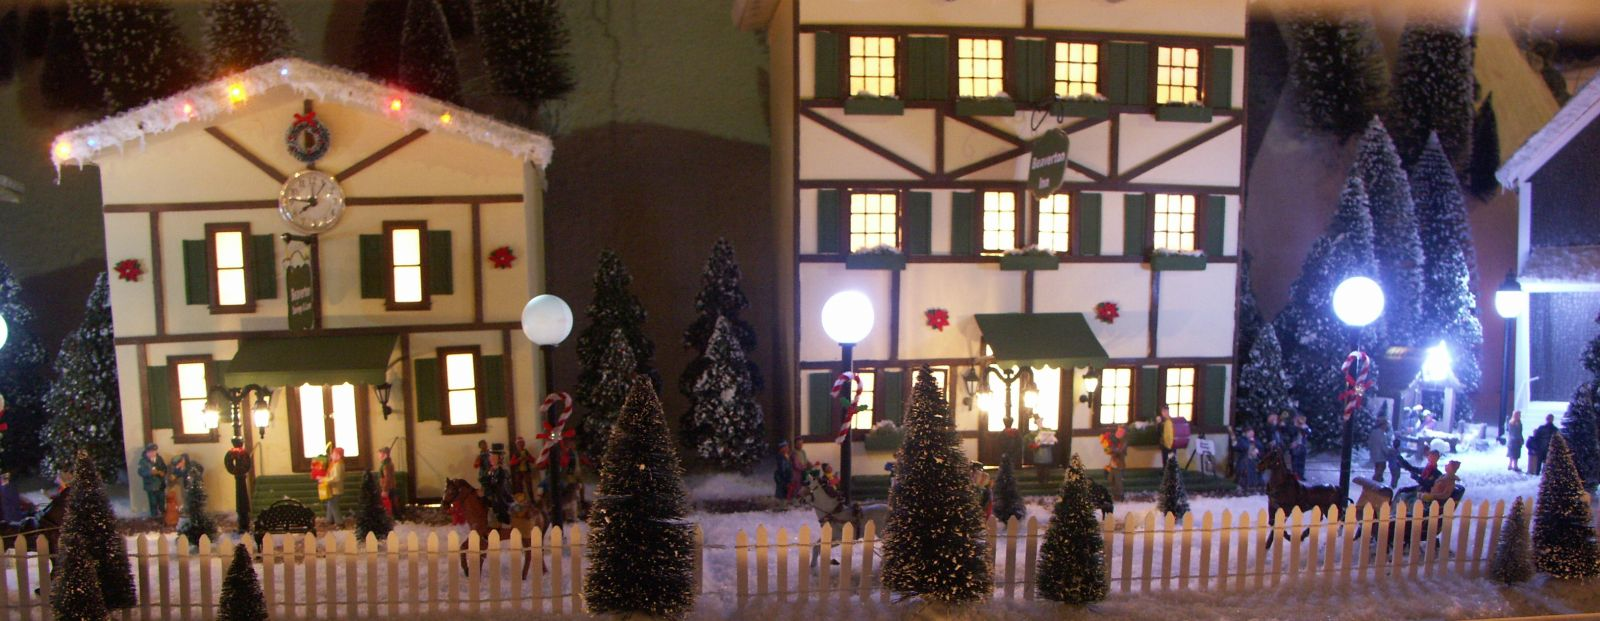 Christmas Village 4 064